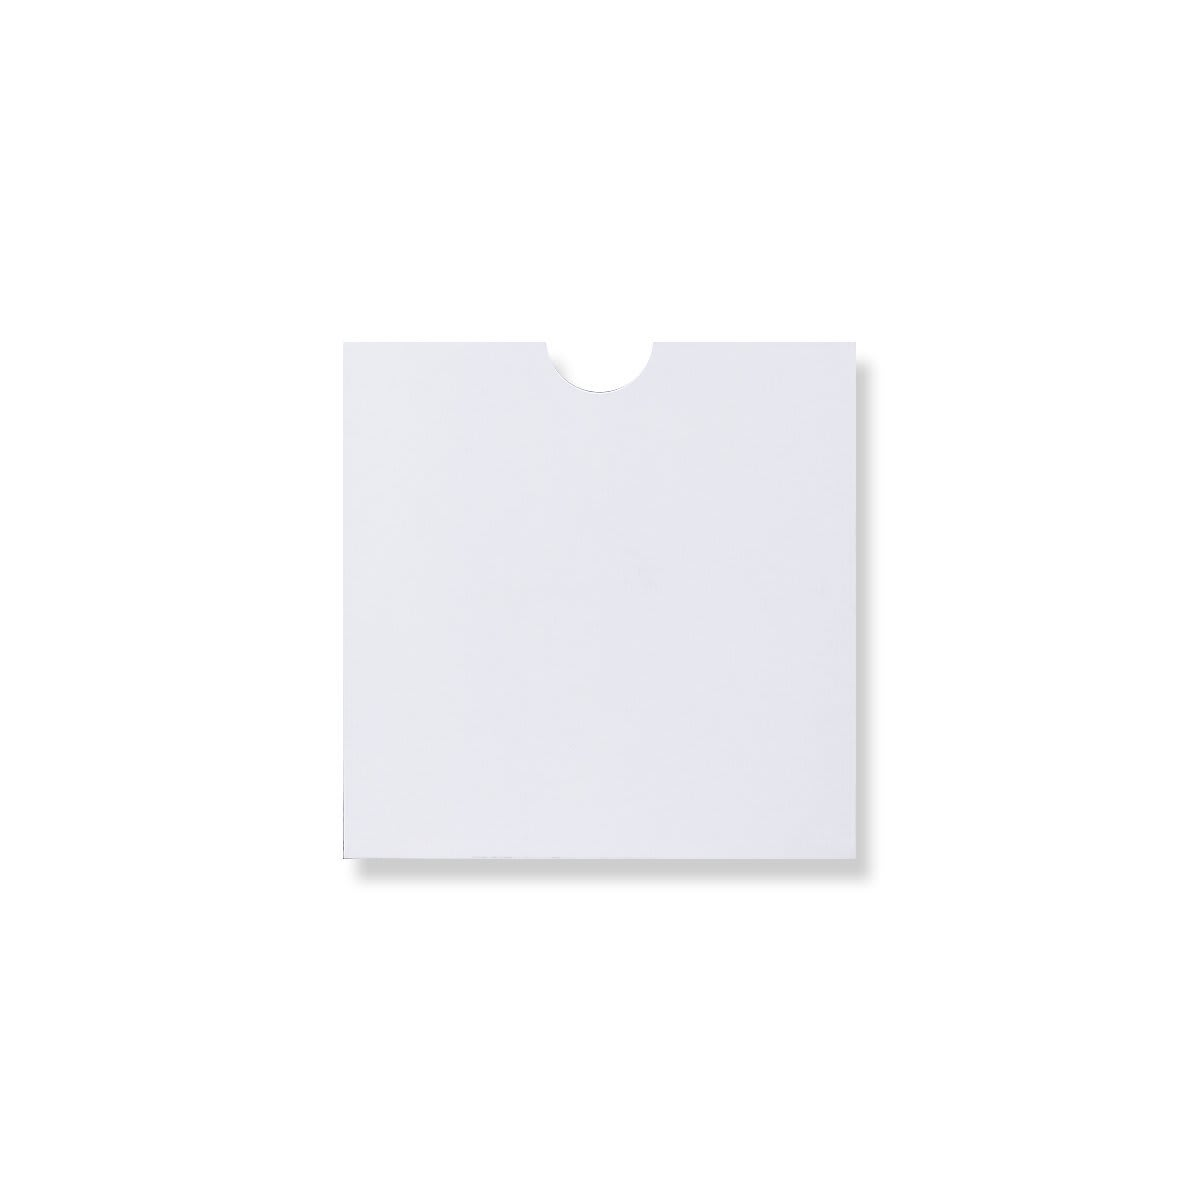 125 x 125mm WHITE ALL BOARD ENVELOPES